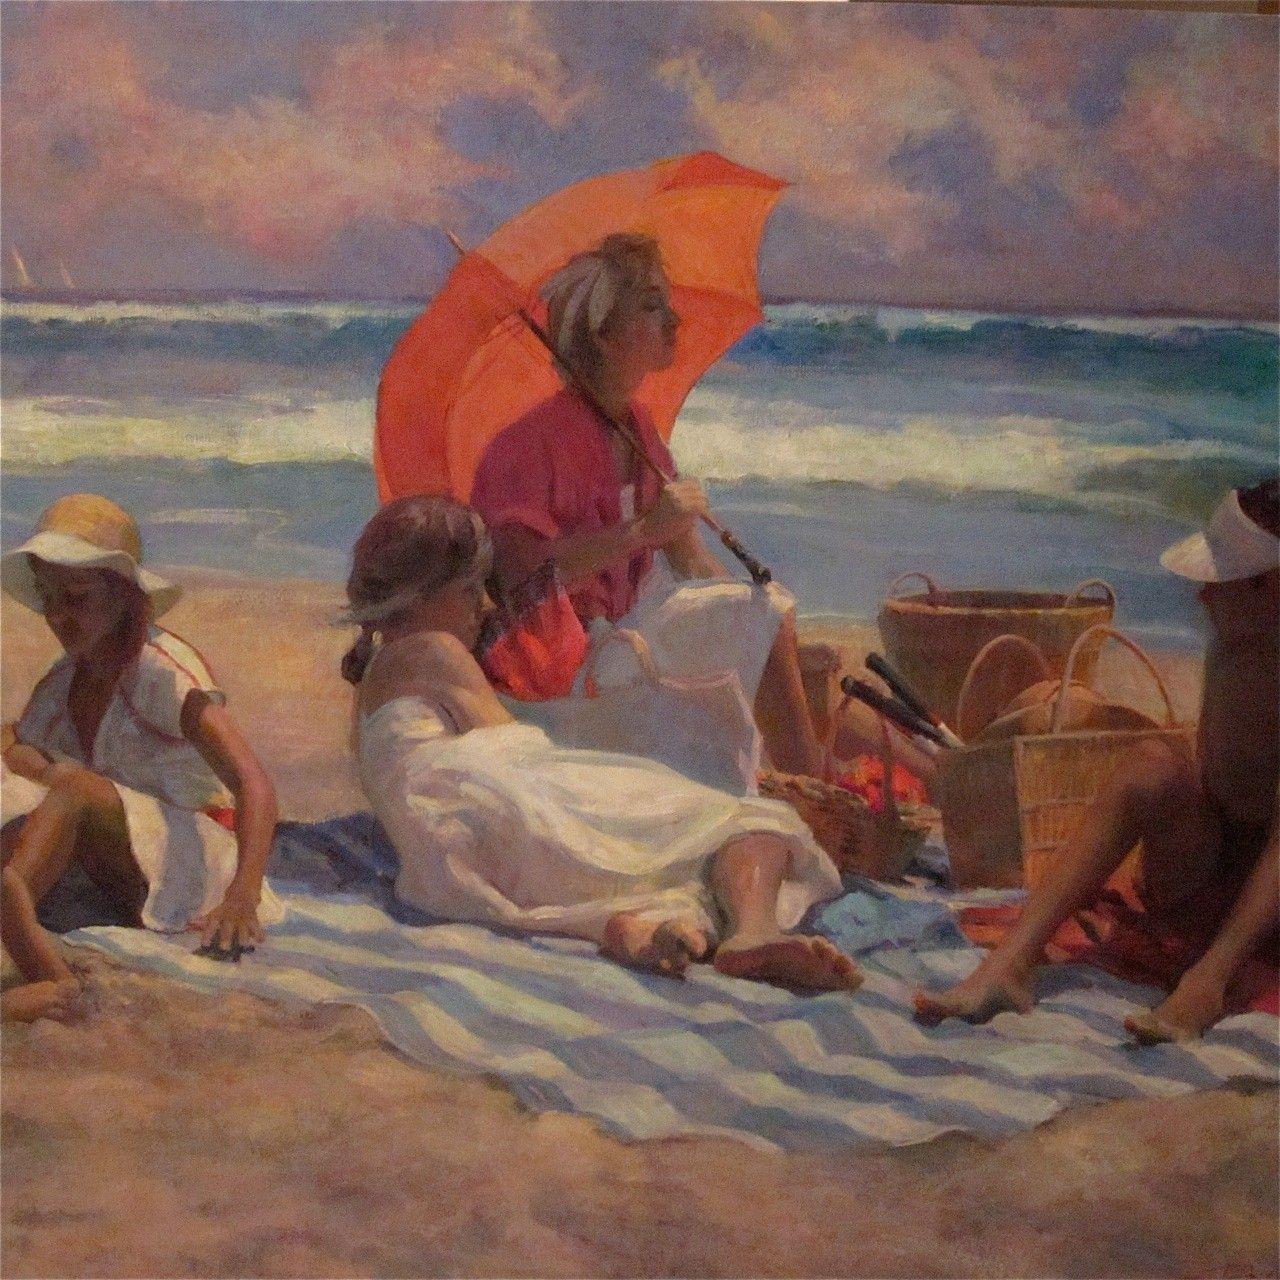 Don hatfield 1947 romantic impressionist painter